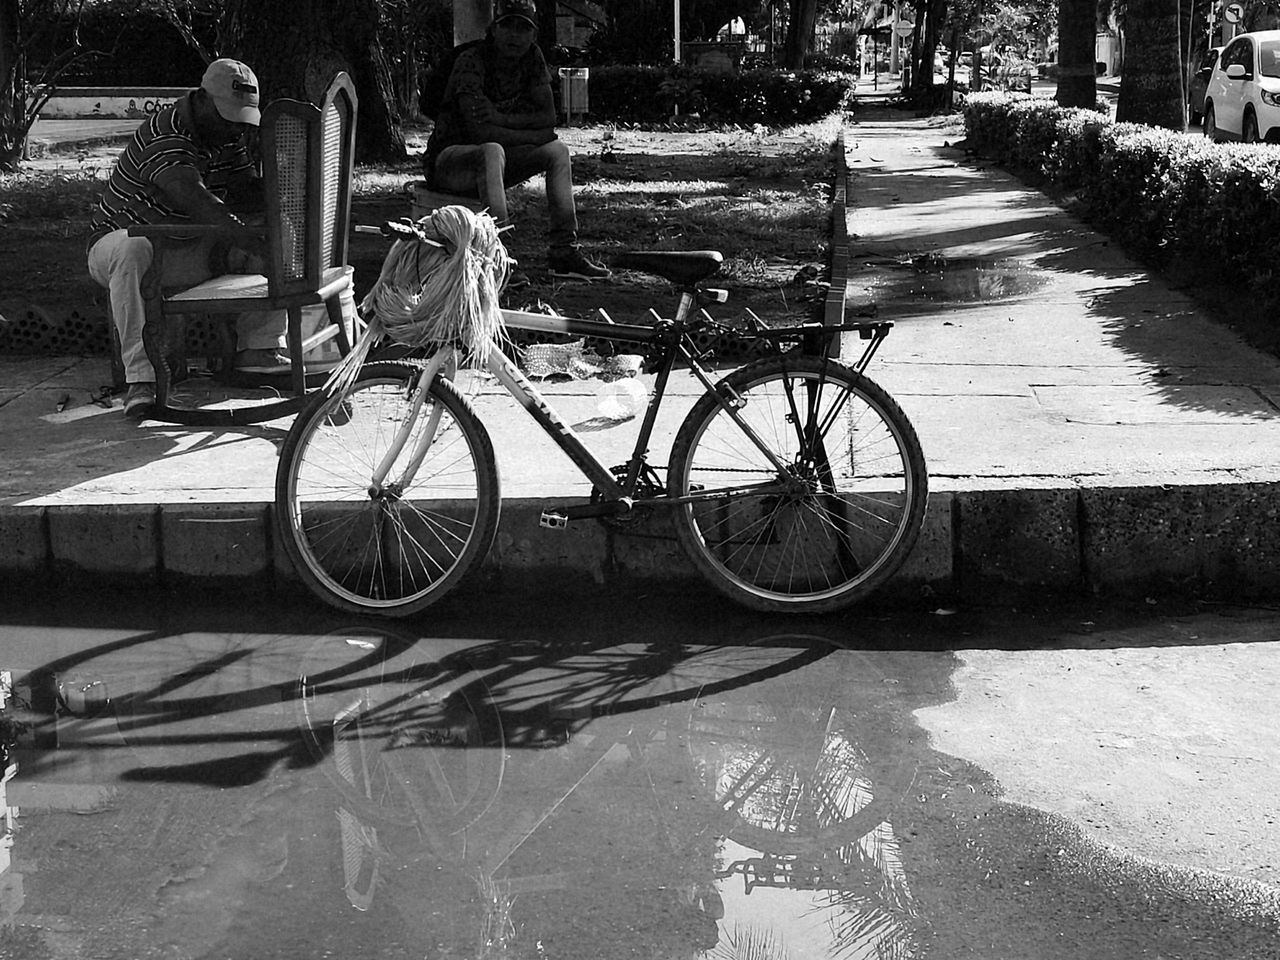 Turism Streetphotography Travel Photography City Street Travel Destinations Editorialphotography Cartagena, Colombia